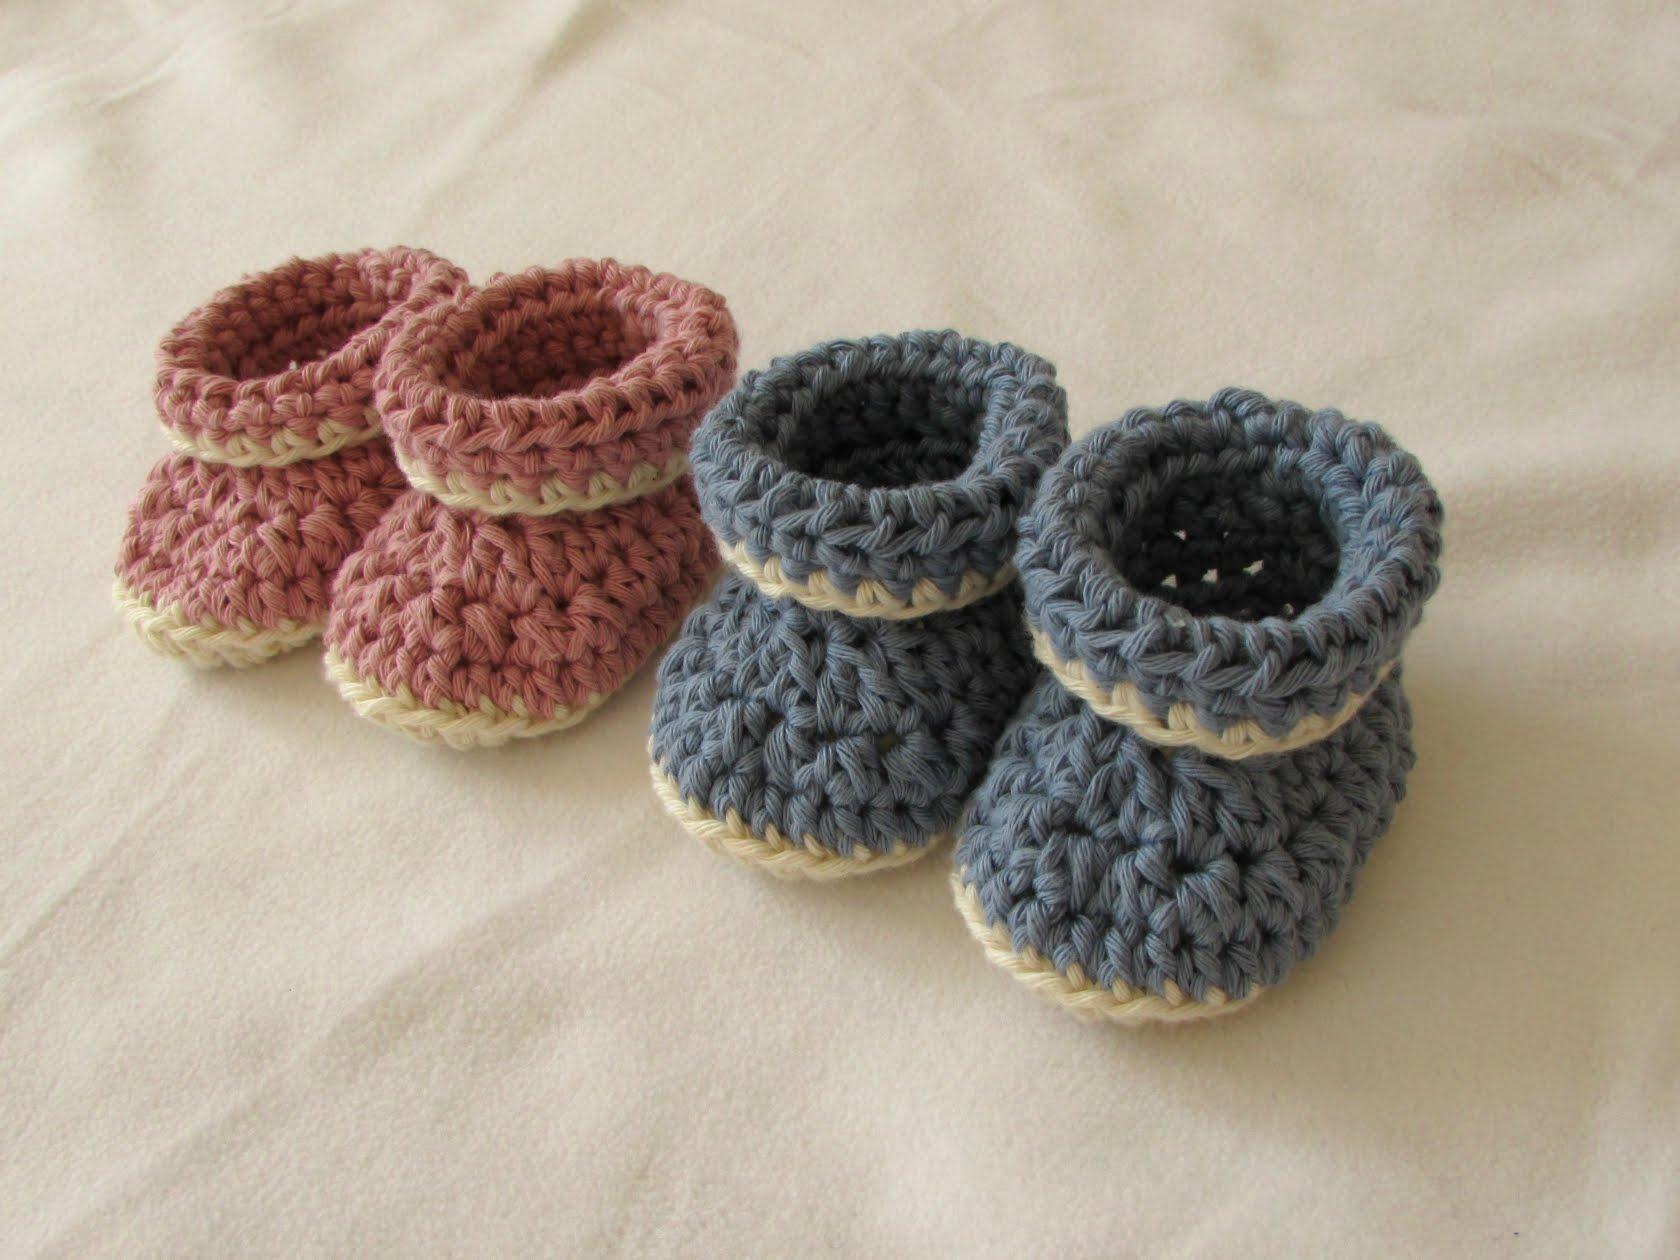 crochet booties very easy crochet cuffed baby booties tutorial - roll top baby shoes for asocjlk